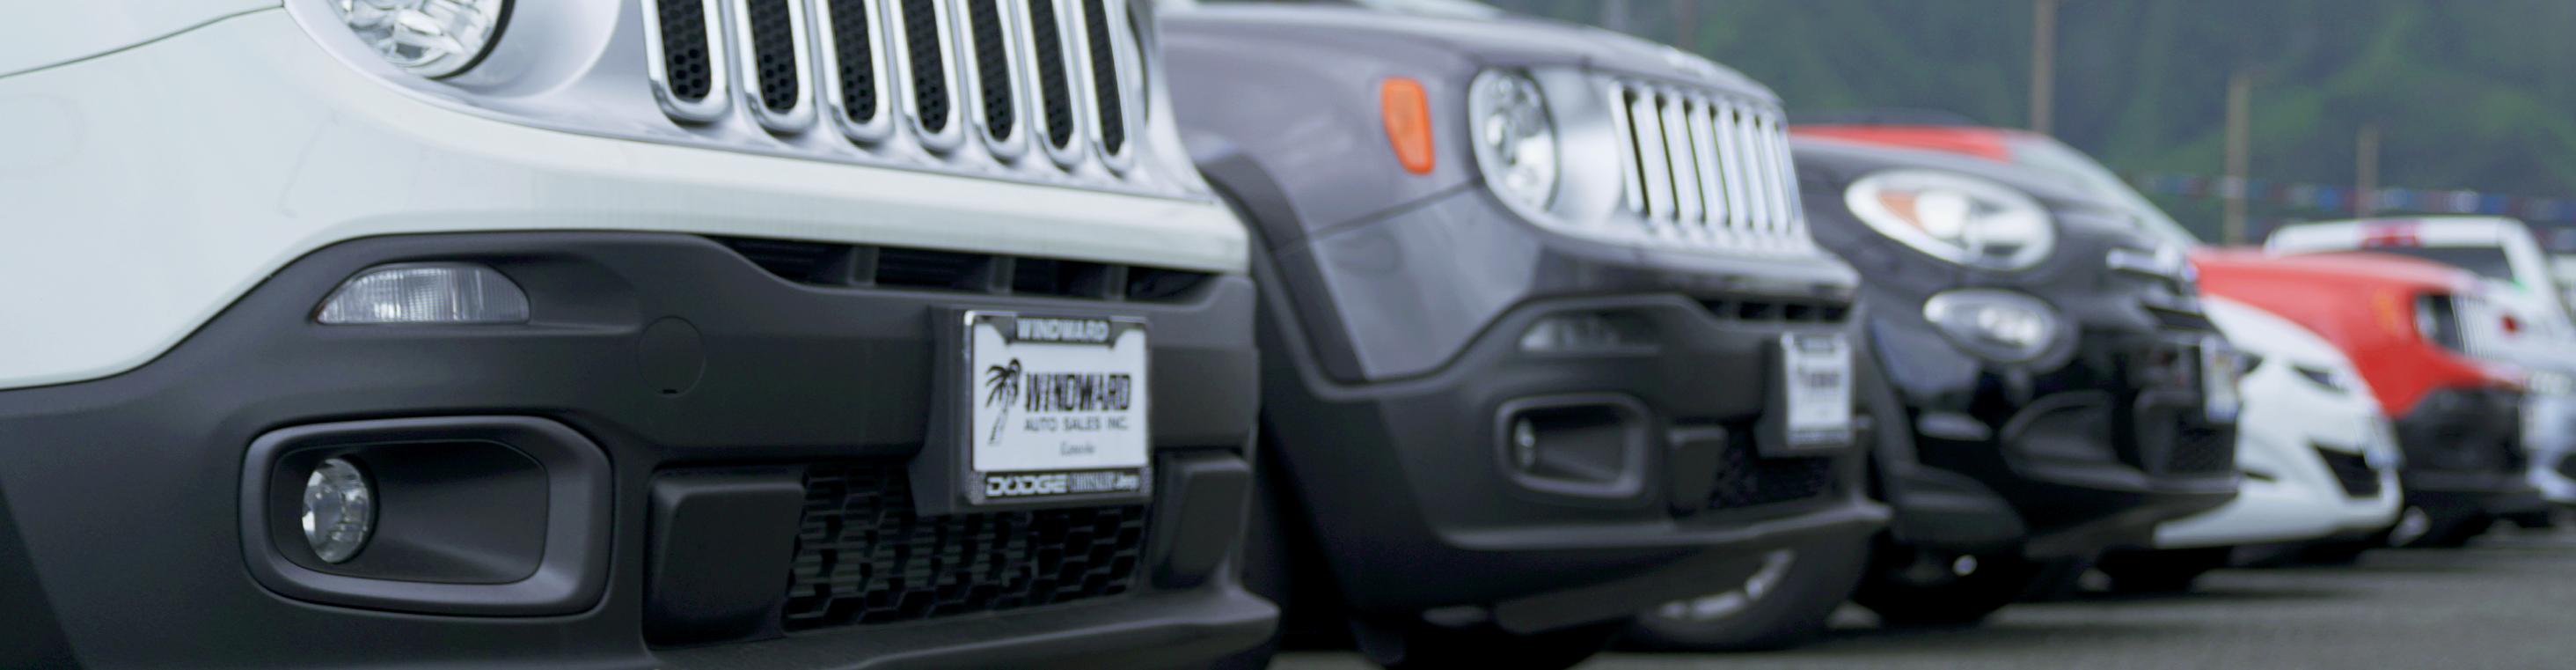 Windward Dodge Chrysler Jeep RAM reviews | Auto Parts & Supplies at 46-177 Kahuhipa St - Kaneohe HI